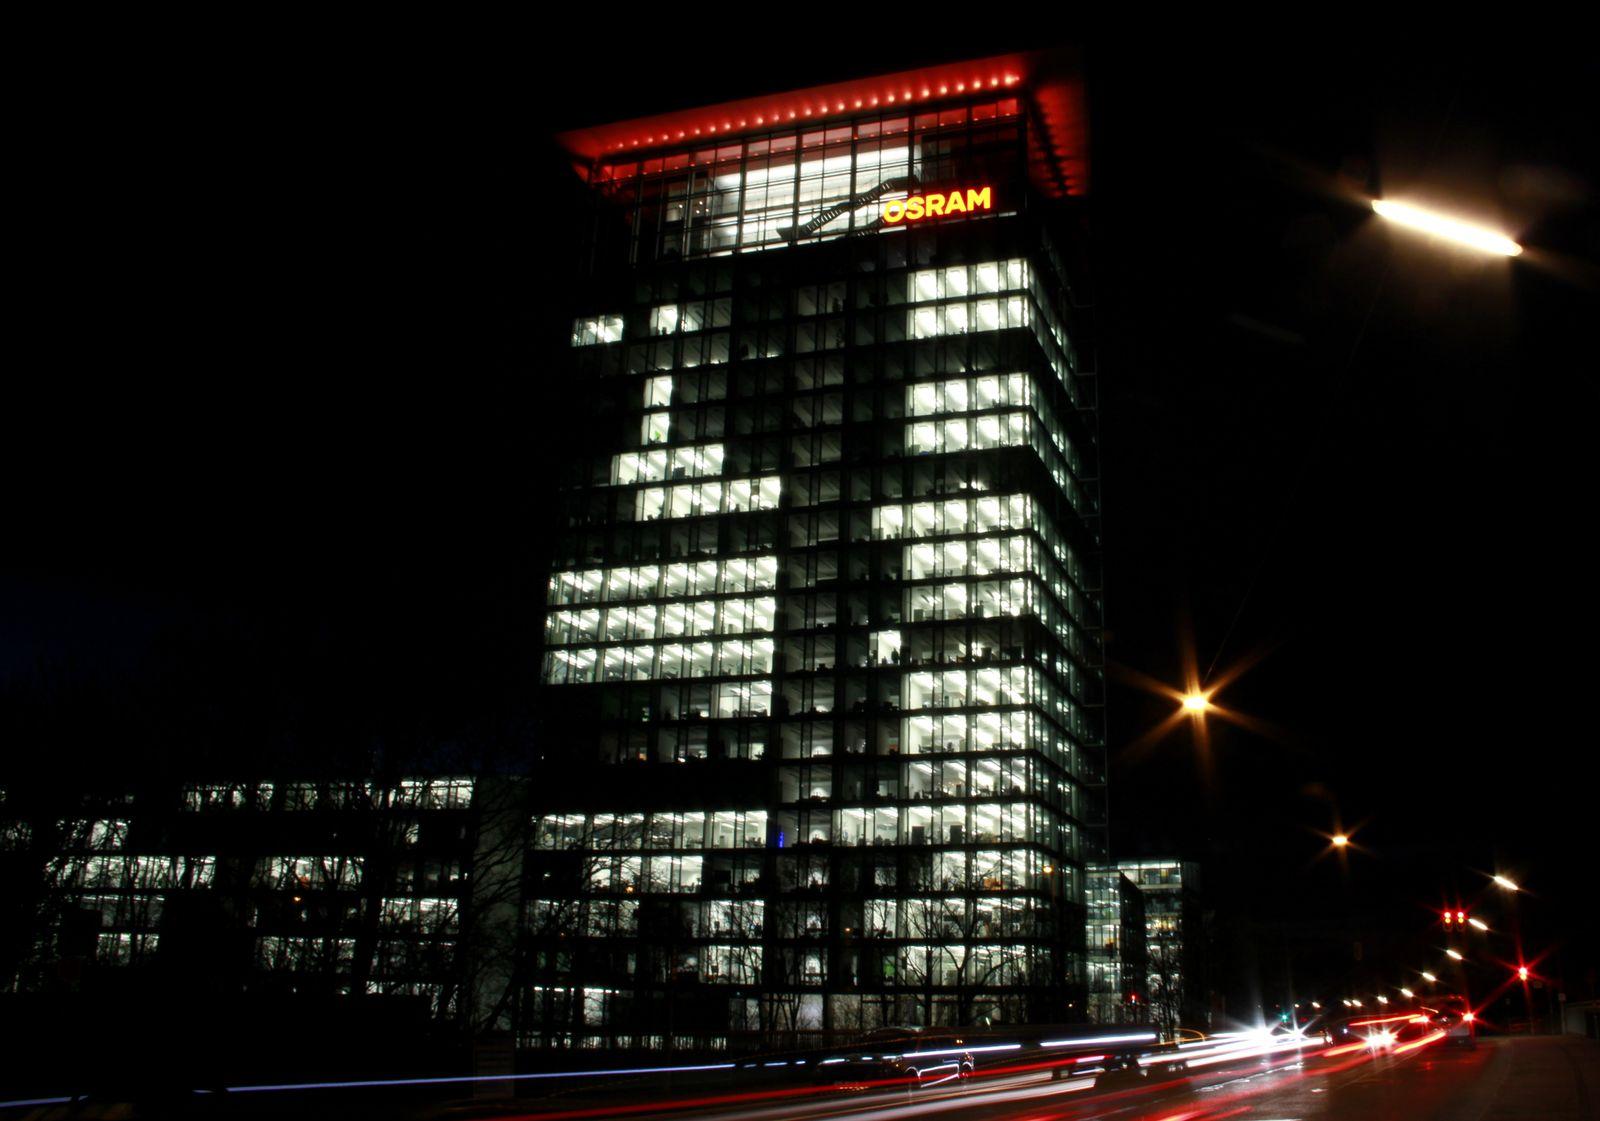 Osram Hauptversammlung / Zentrale